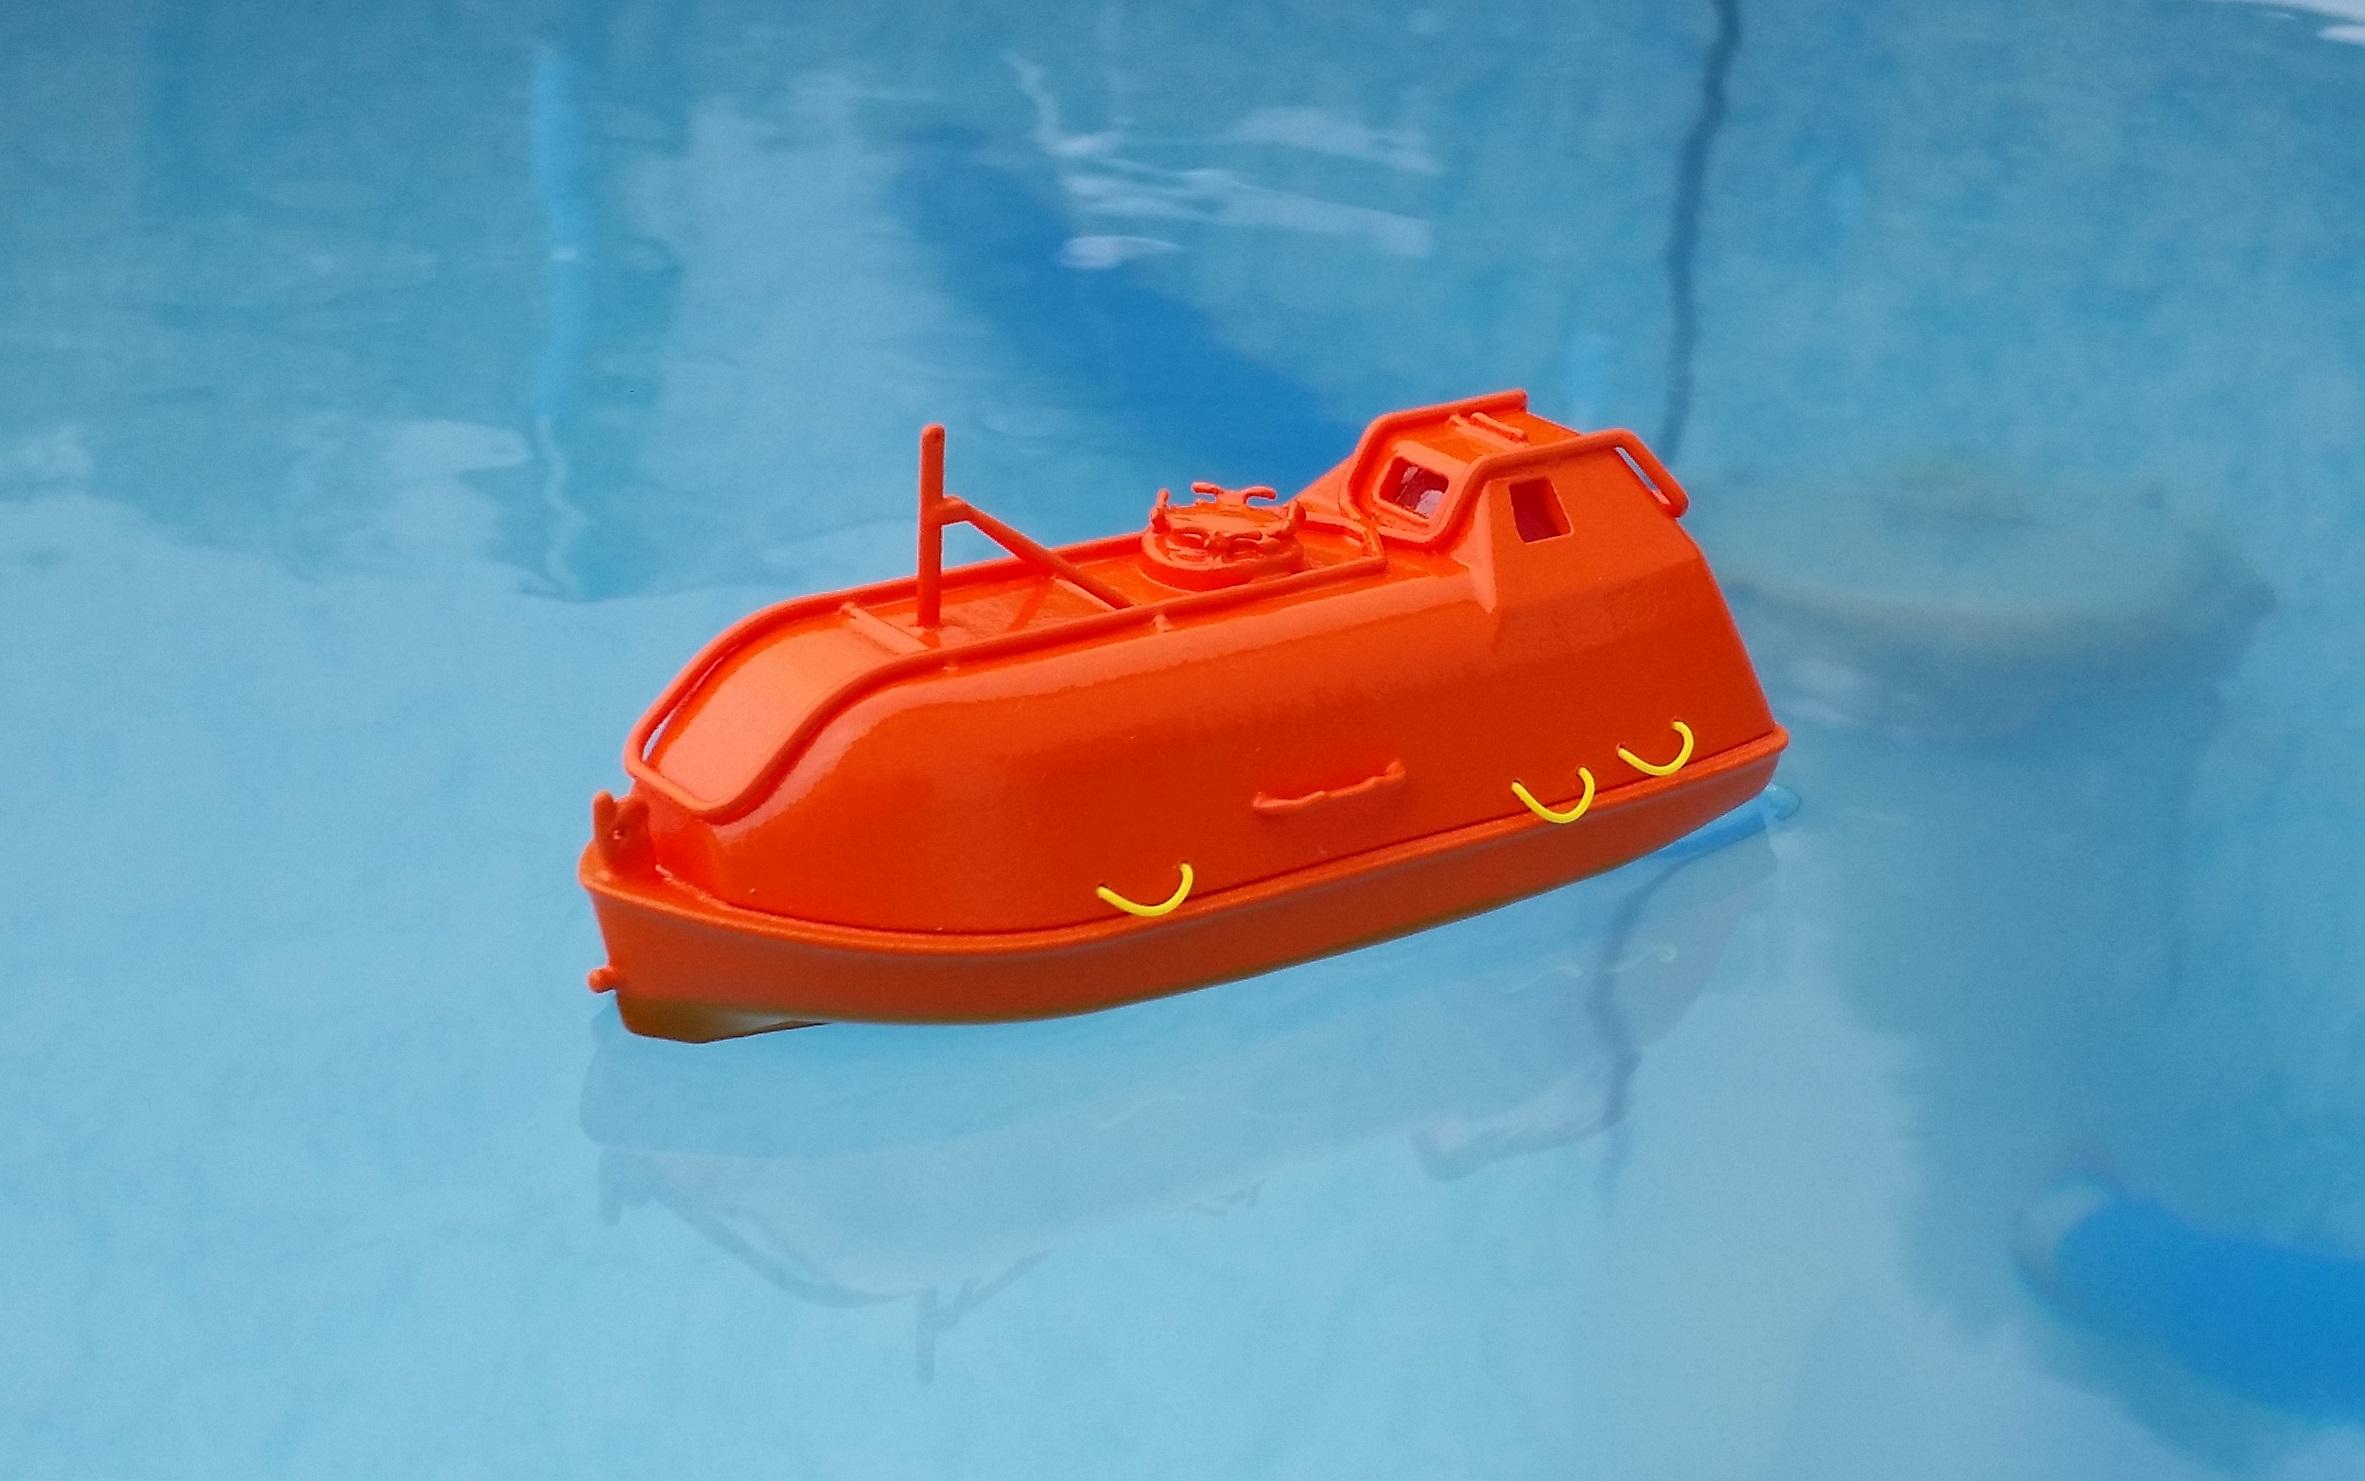 Rettungsboot1.jpg